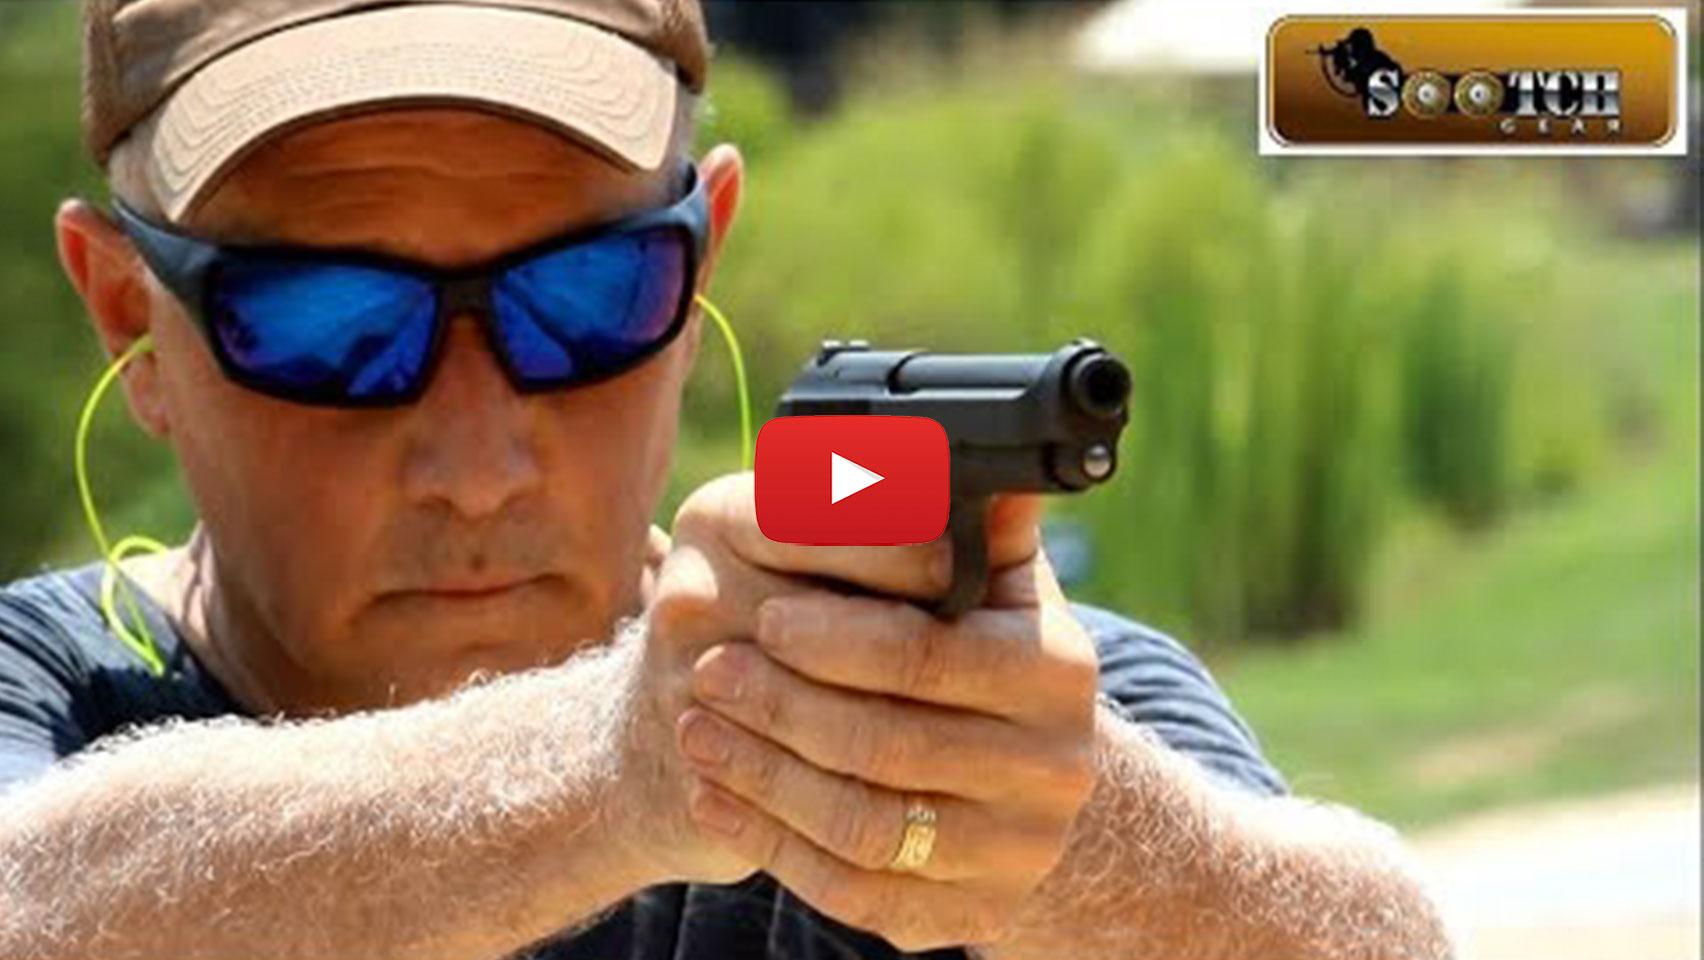 Beretta M1951 9mm Semi-Auto Pistol with 1 Mag, 8rd, NRA